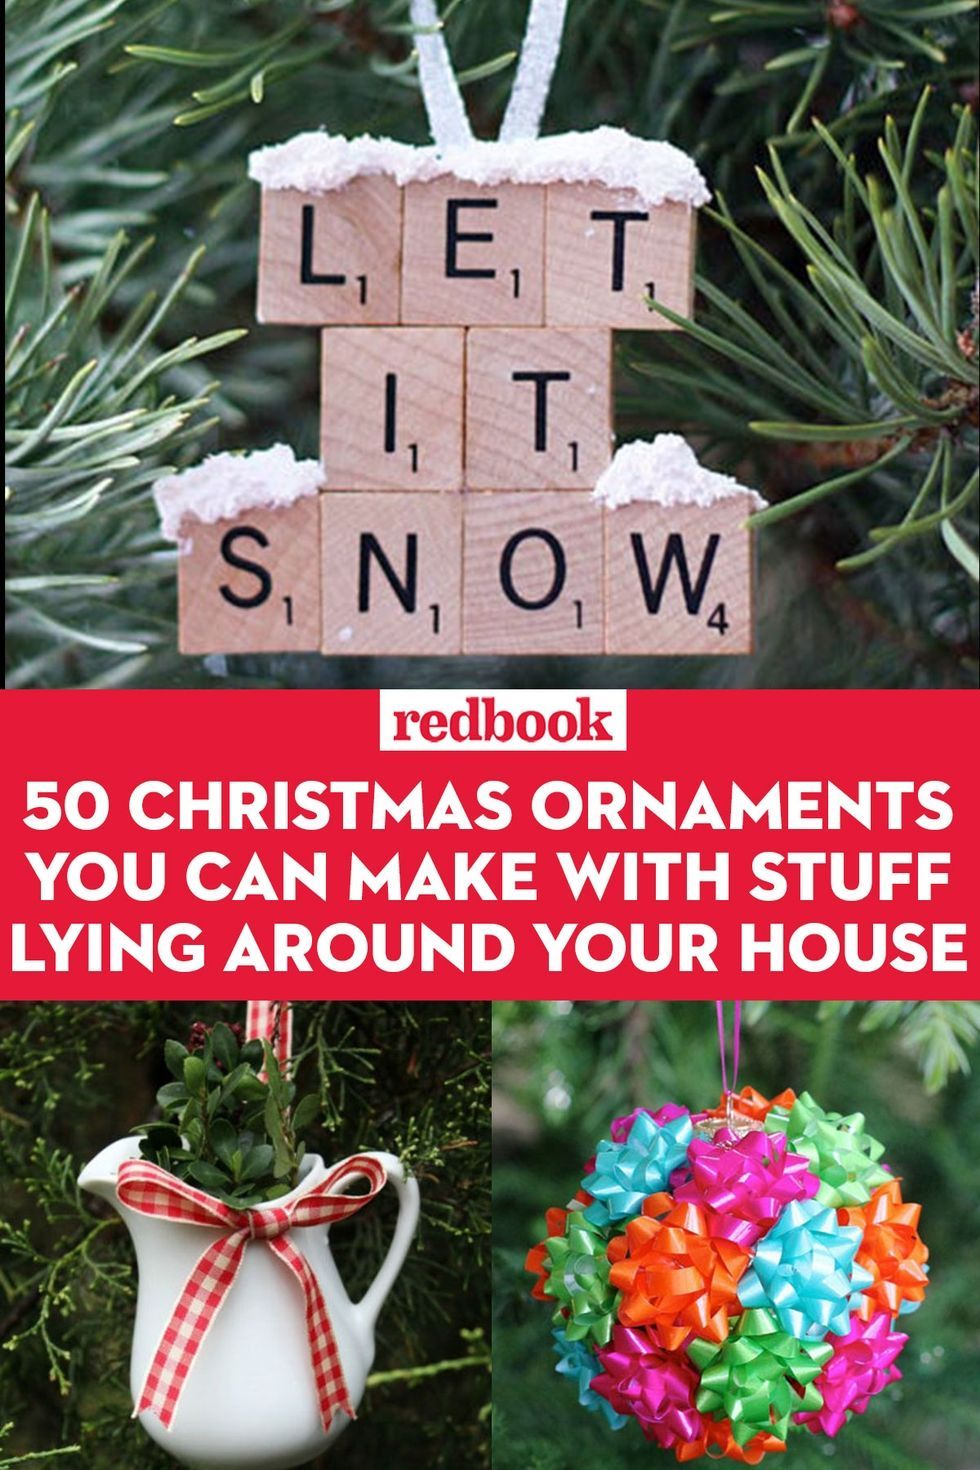 59 Christmas Tree Ornaments Made From Stuff Lying Around Your House Christmas Ornaments Homemade Christmas Diy Family Christmas Gifts